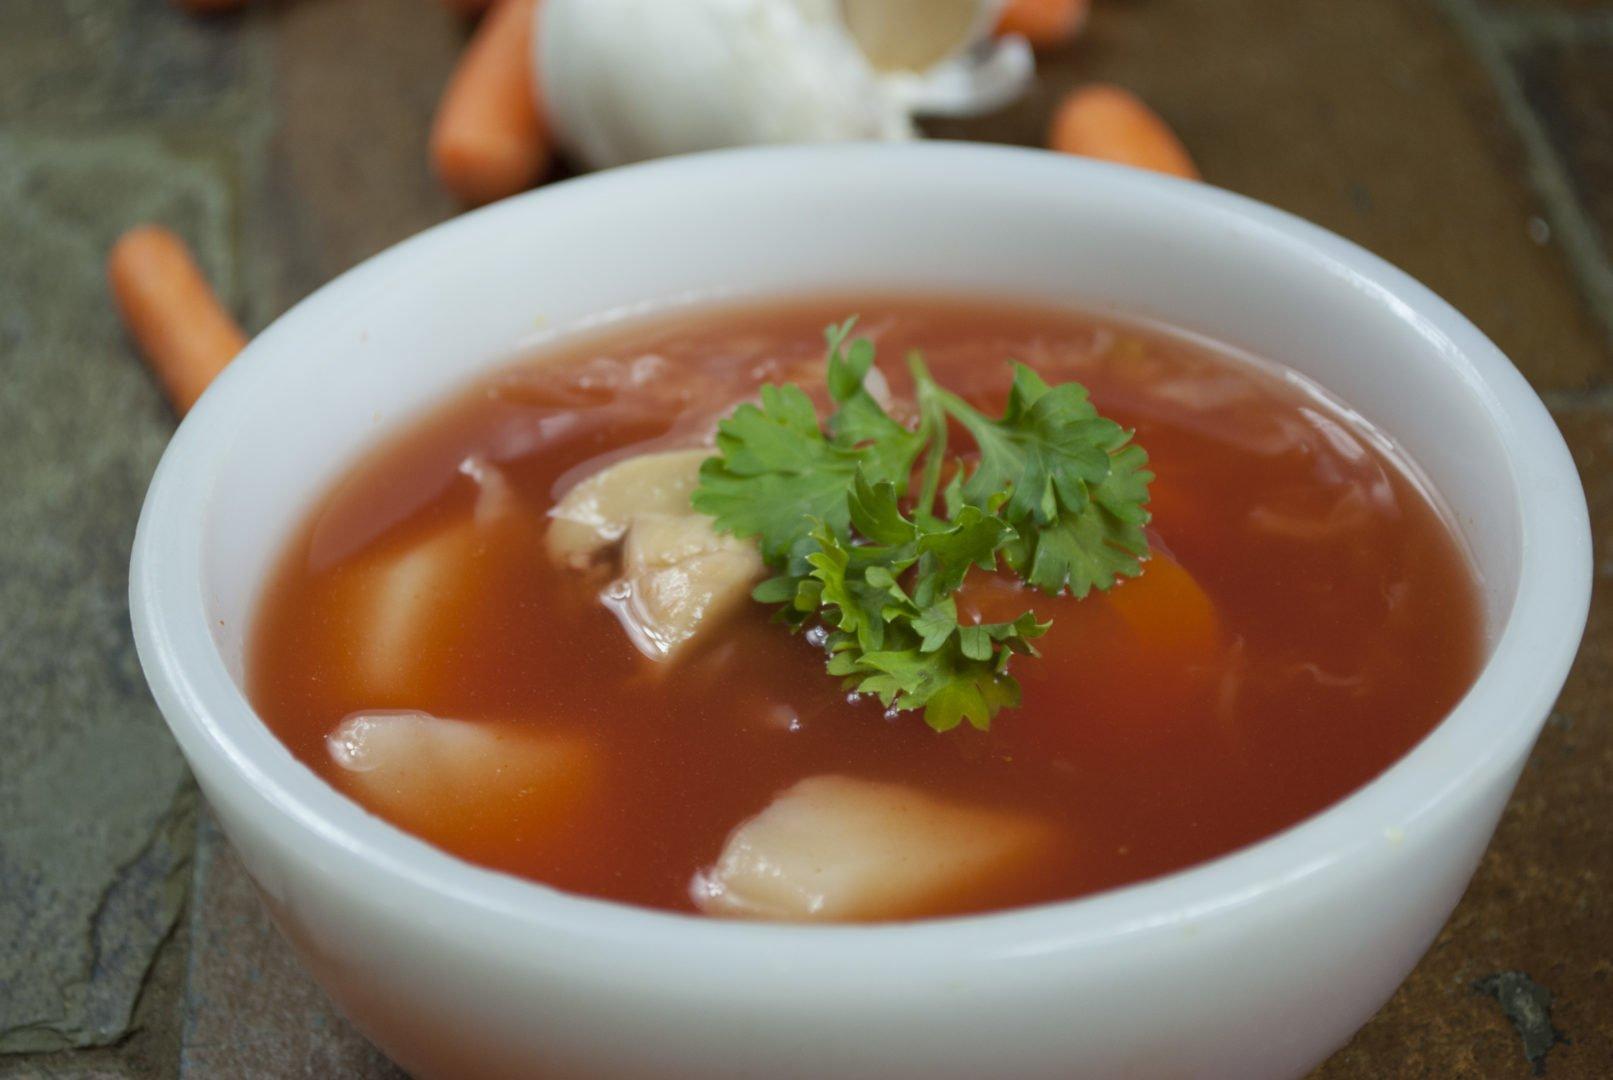 Soup - Mushroom Borscht - Borscht With Mushrooms And Cabbage